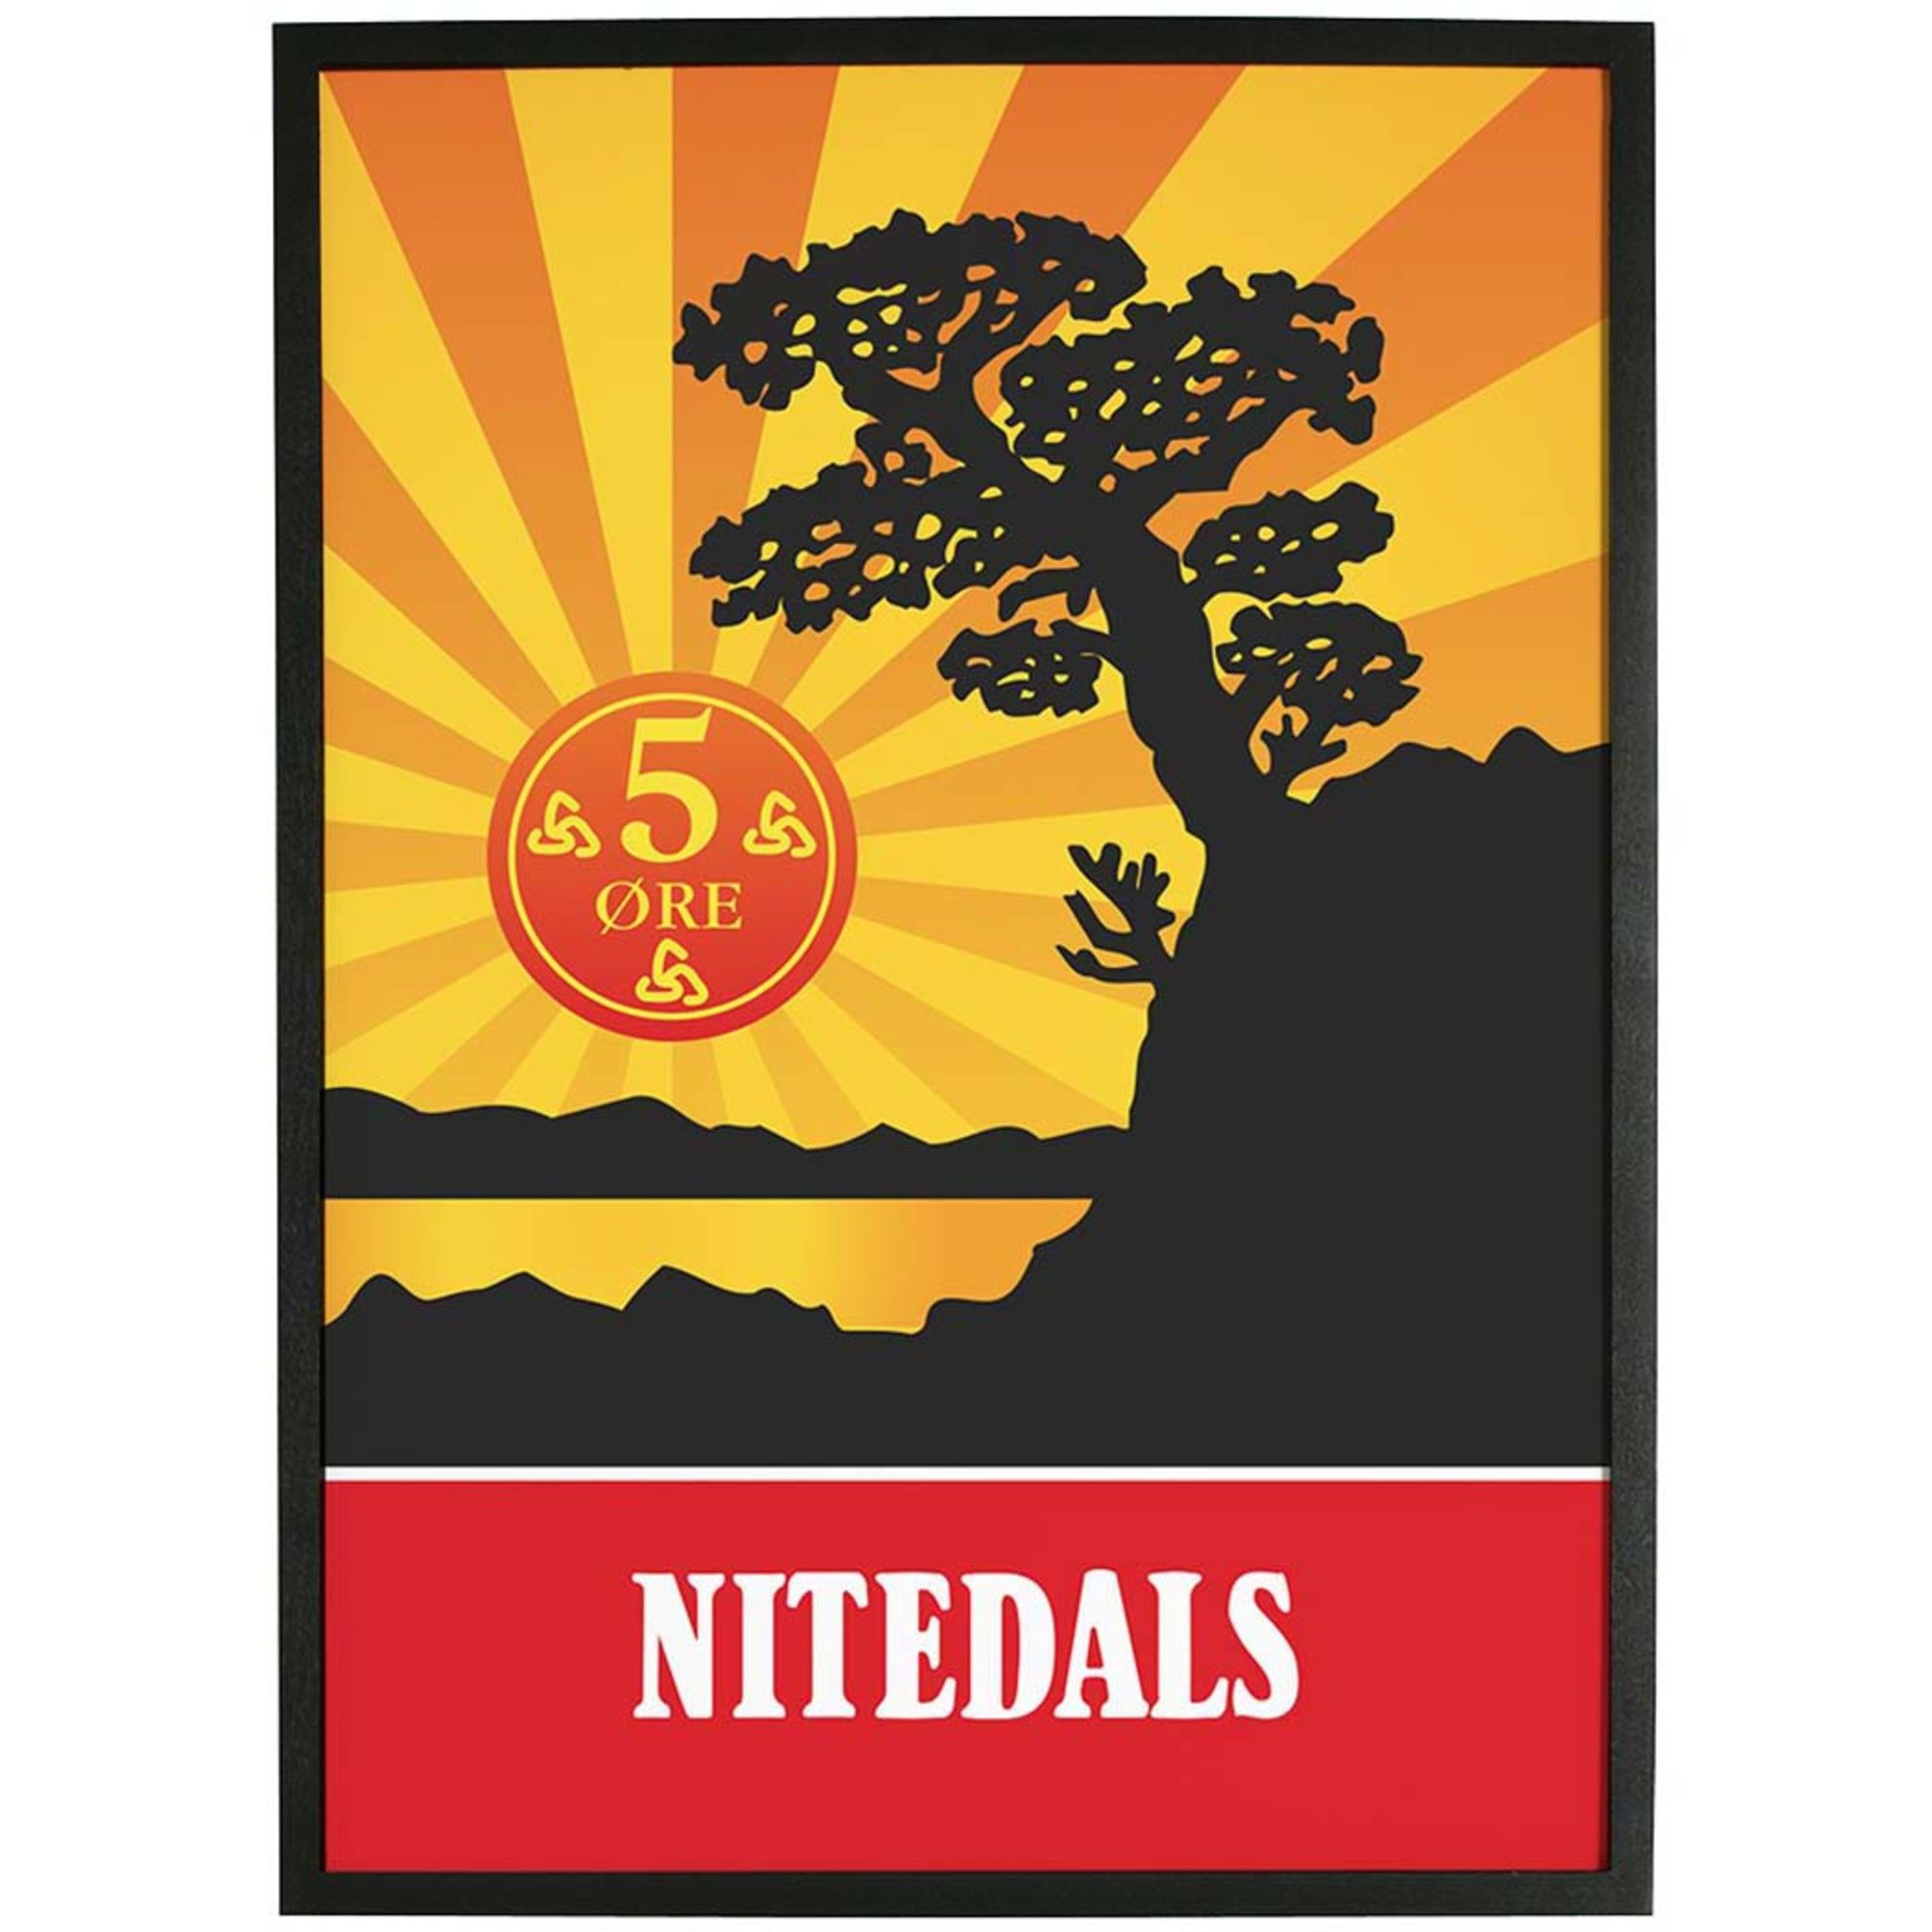 Nitedals Nitedals Poster Original 50×70 cm